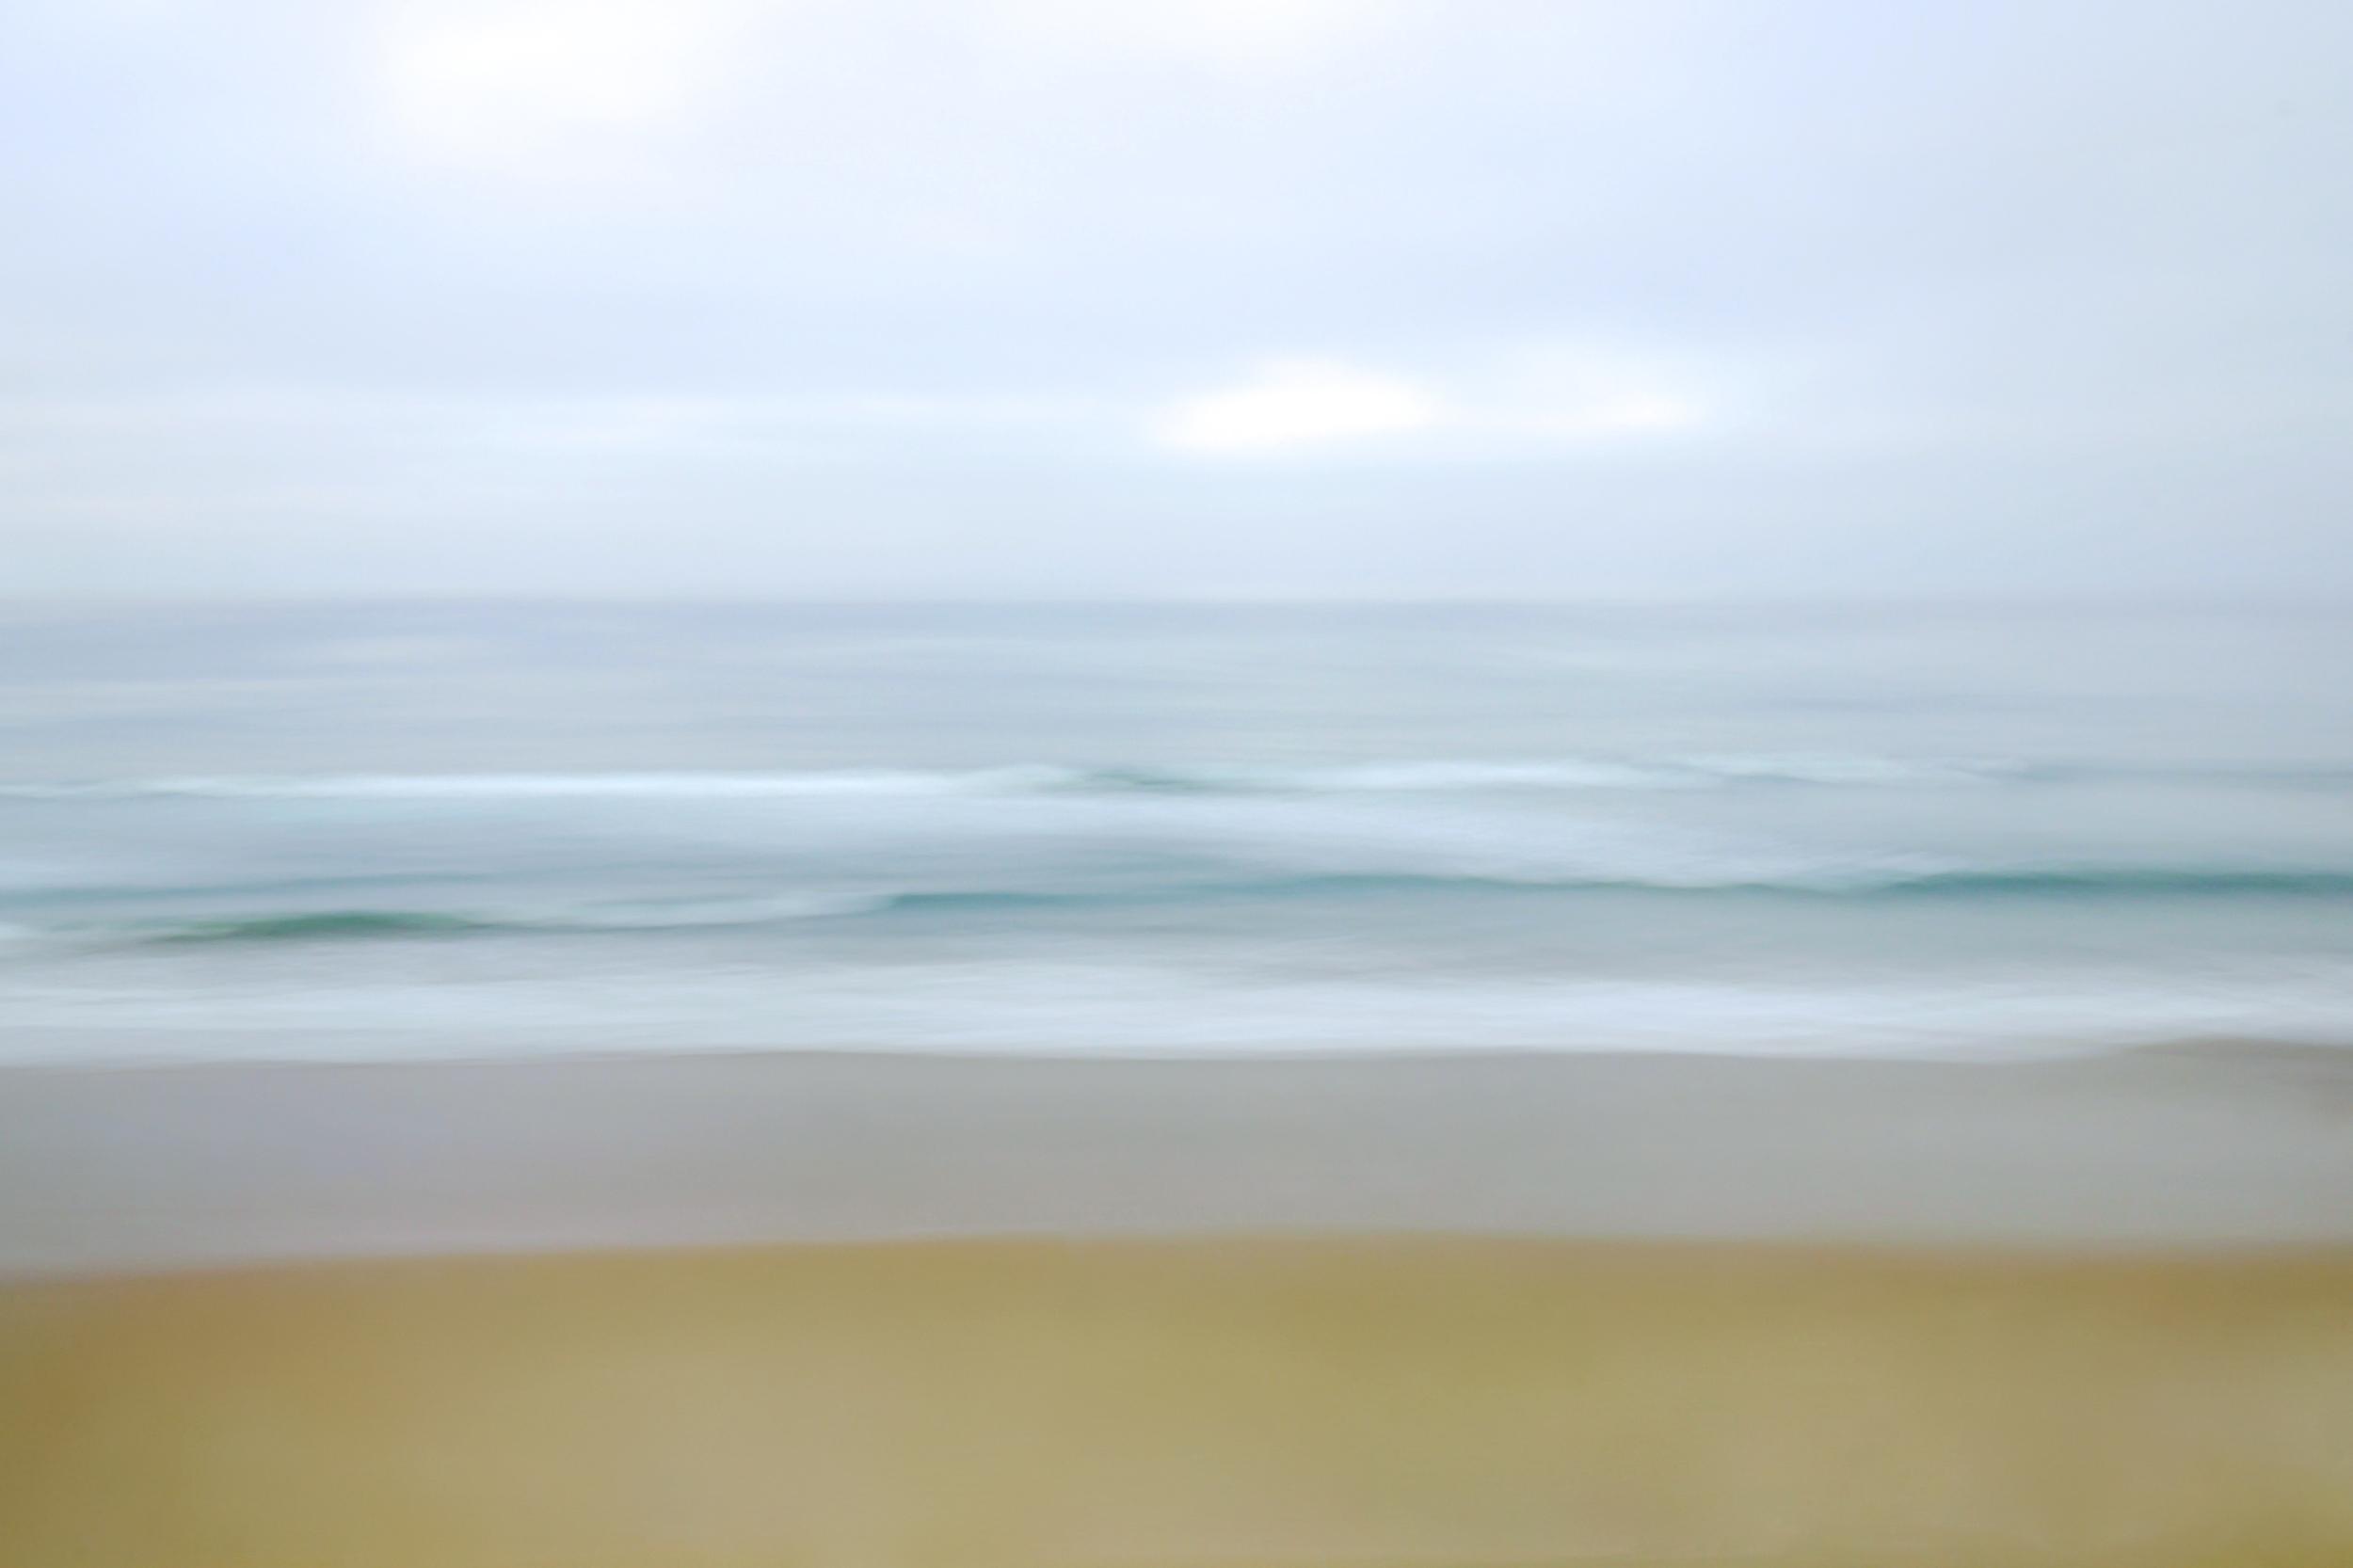 Training Waves